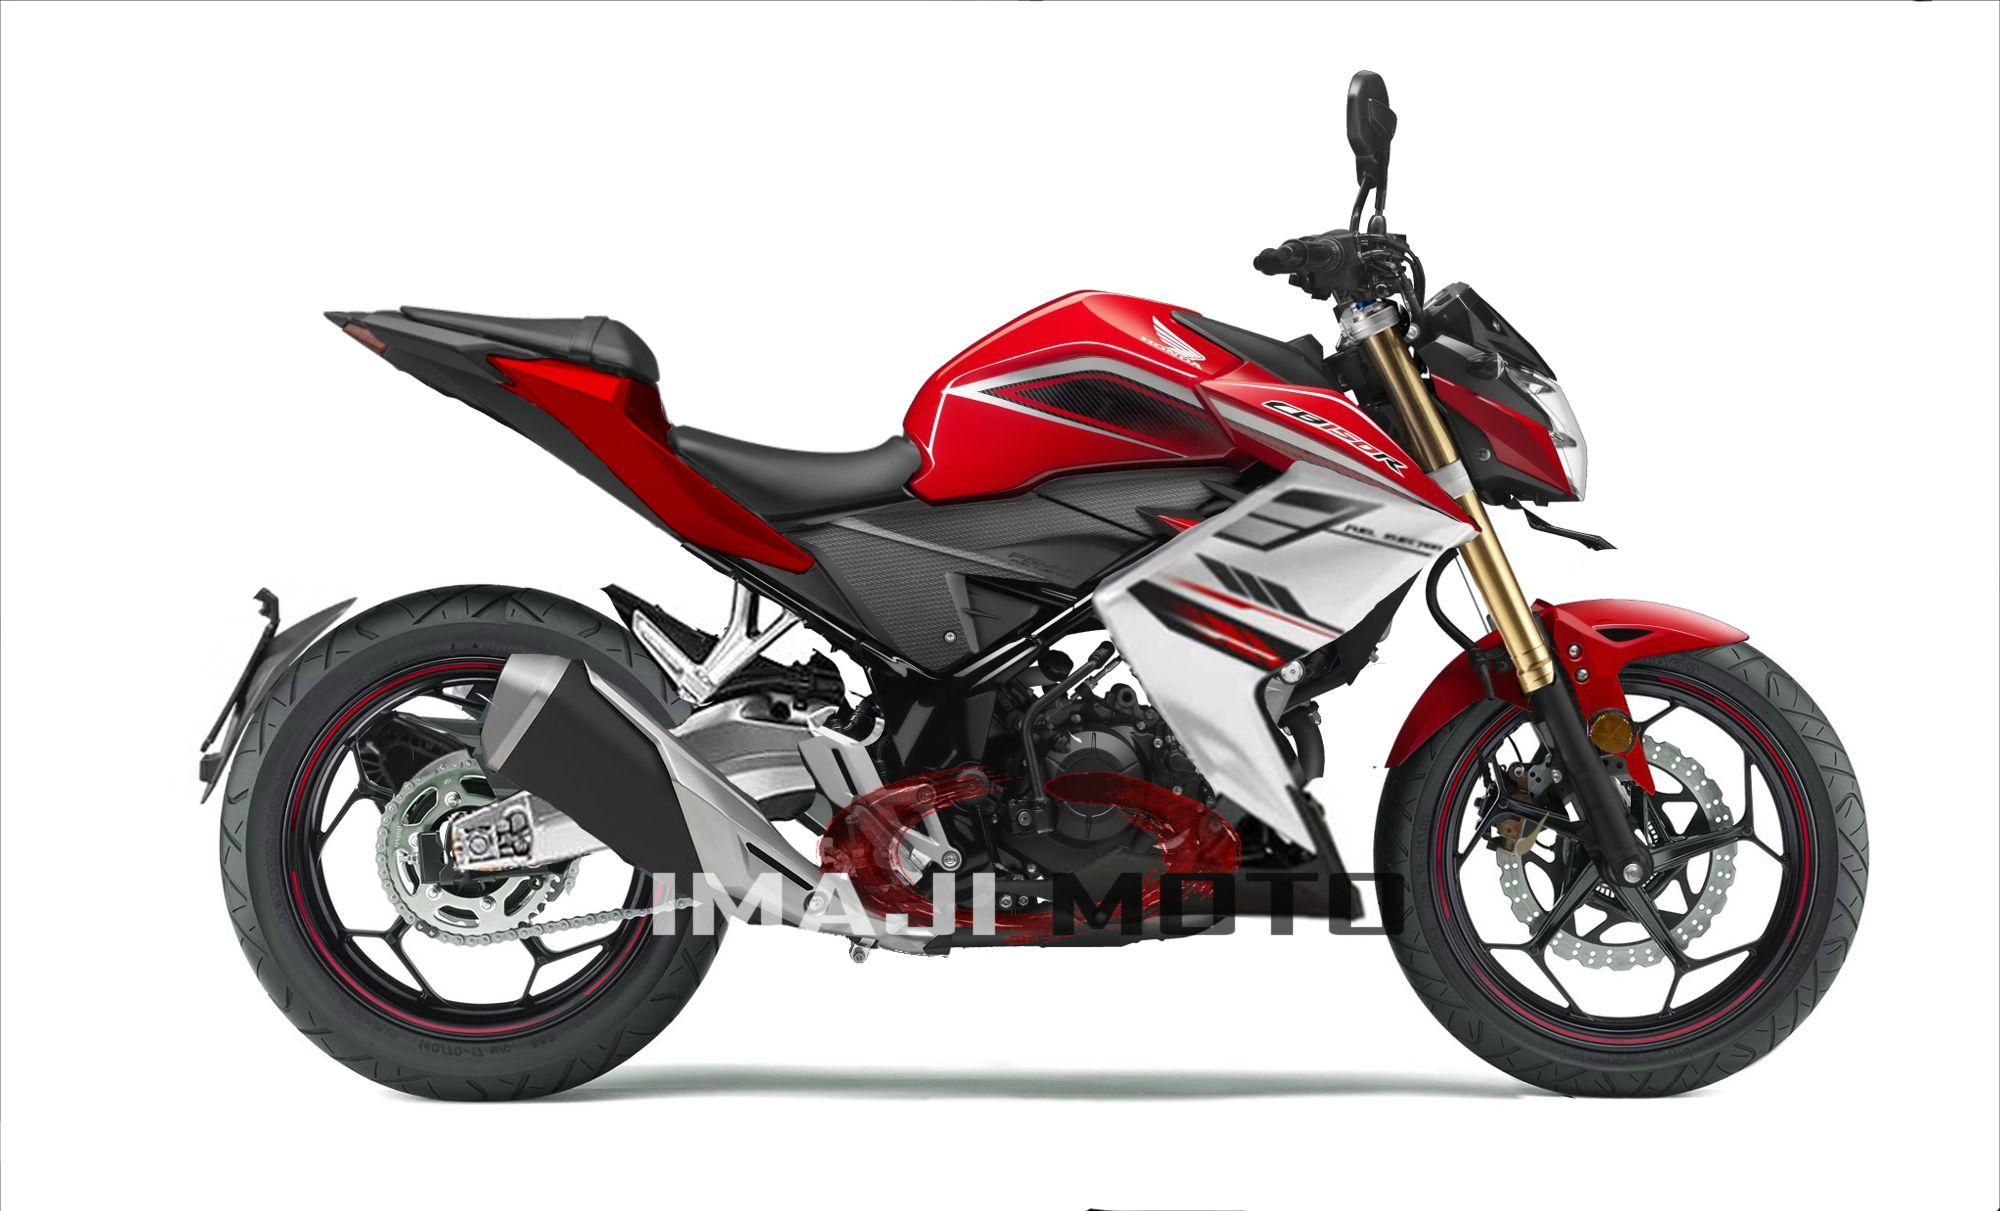 Naik Kelas Cb150r As Requested By Visitor Ducati Ducati Monster